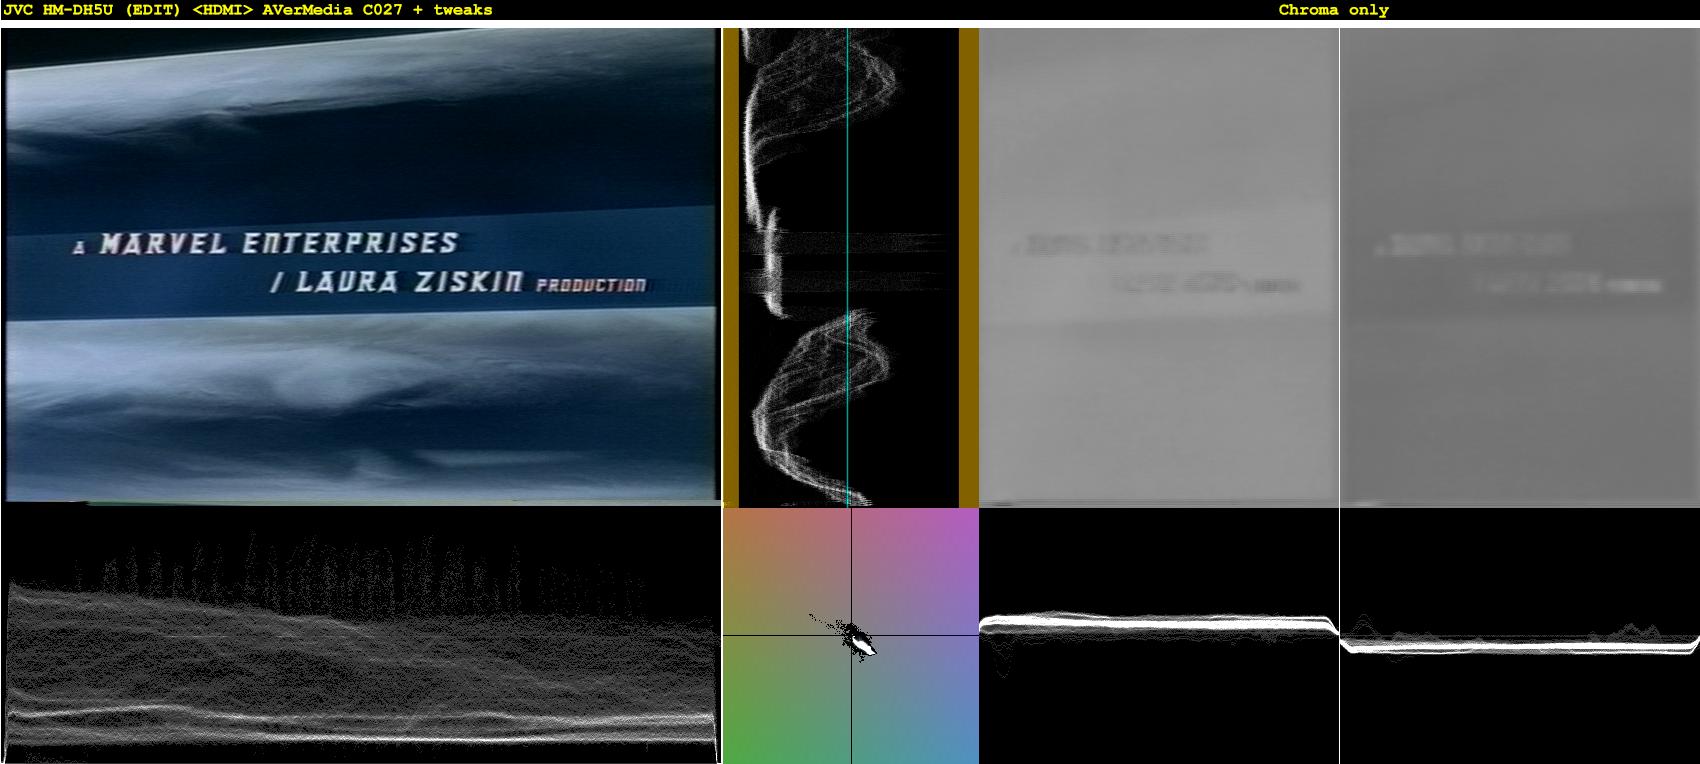 Click image for larger version  Name:0-09-01 - JVC HM-DH5U (EDIT).png Views:1021 Size:818.6 KB ID:37666